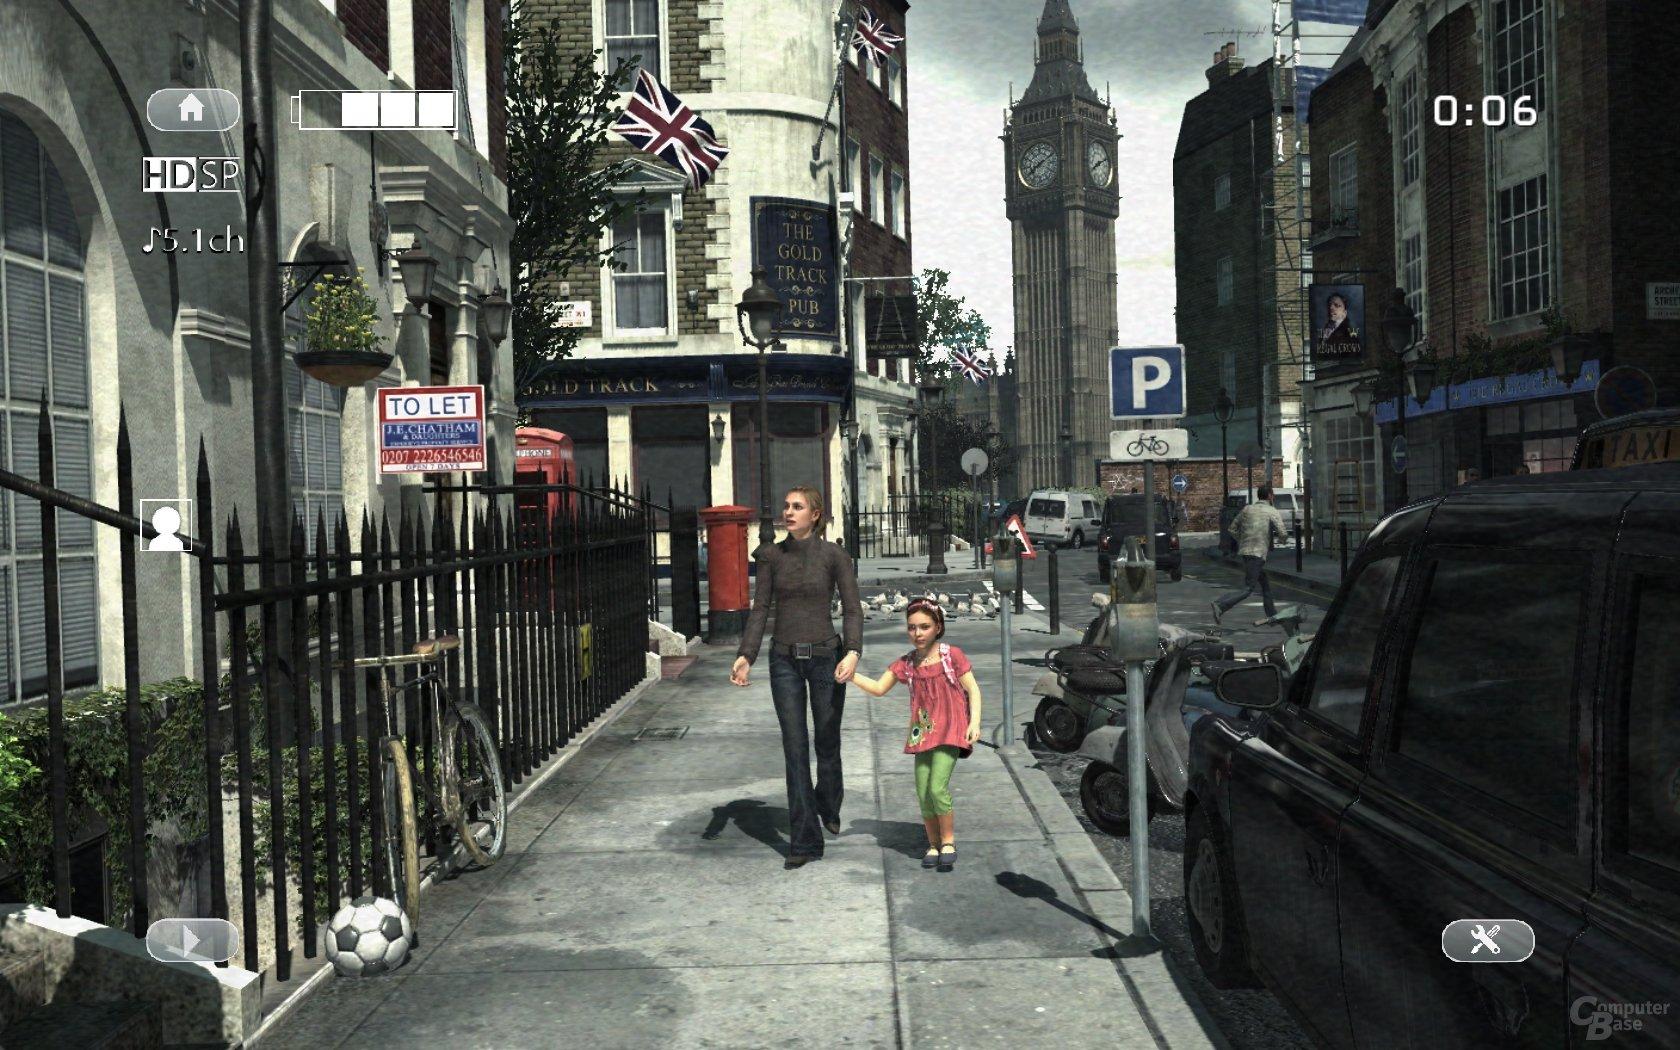 Modern Warfare 3: Familien-Idylle in London: Der Mini-Skandal gehört dazu